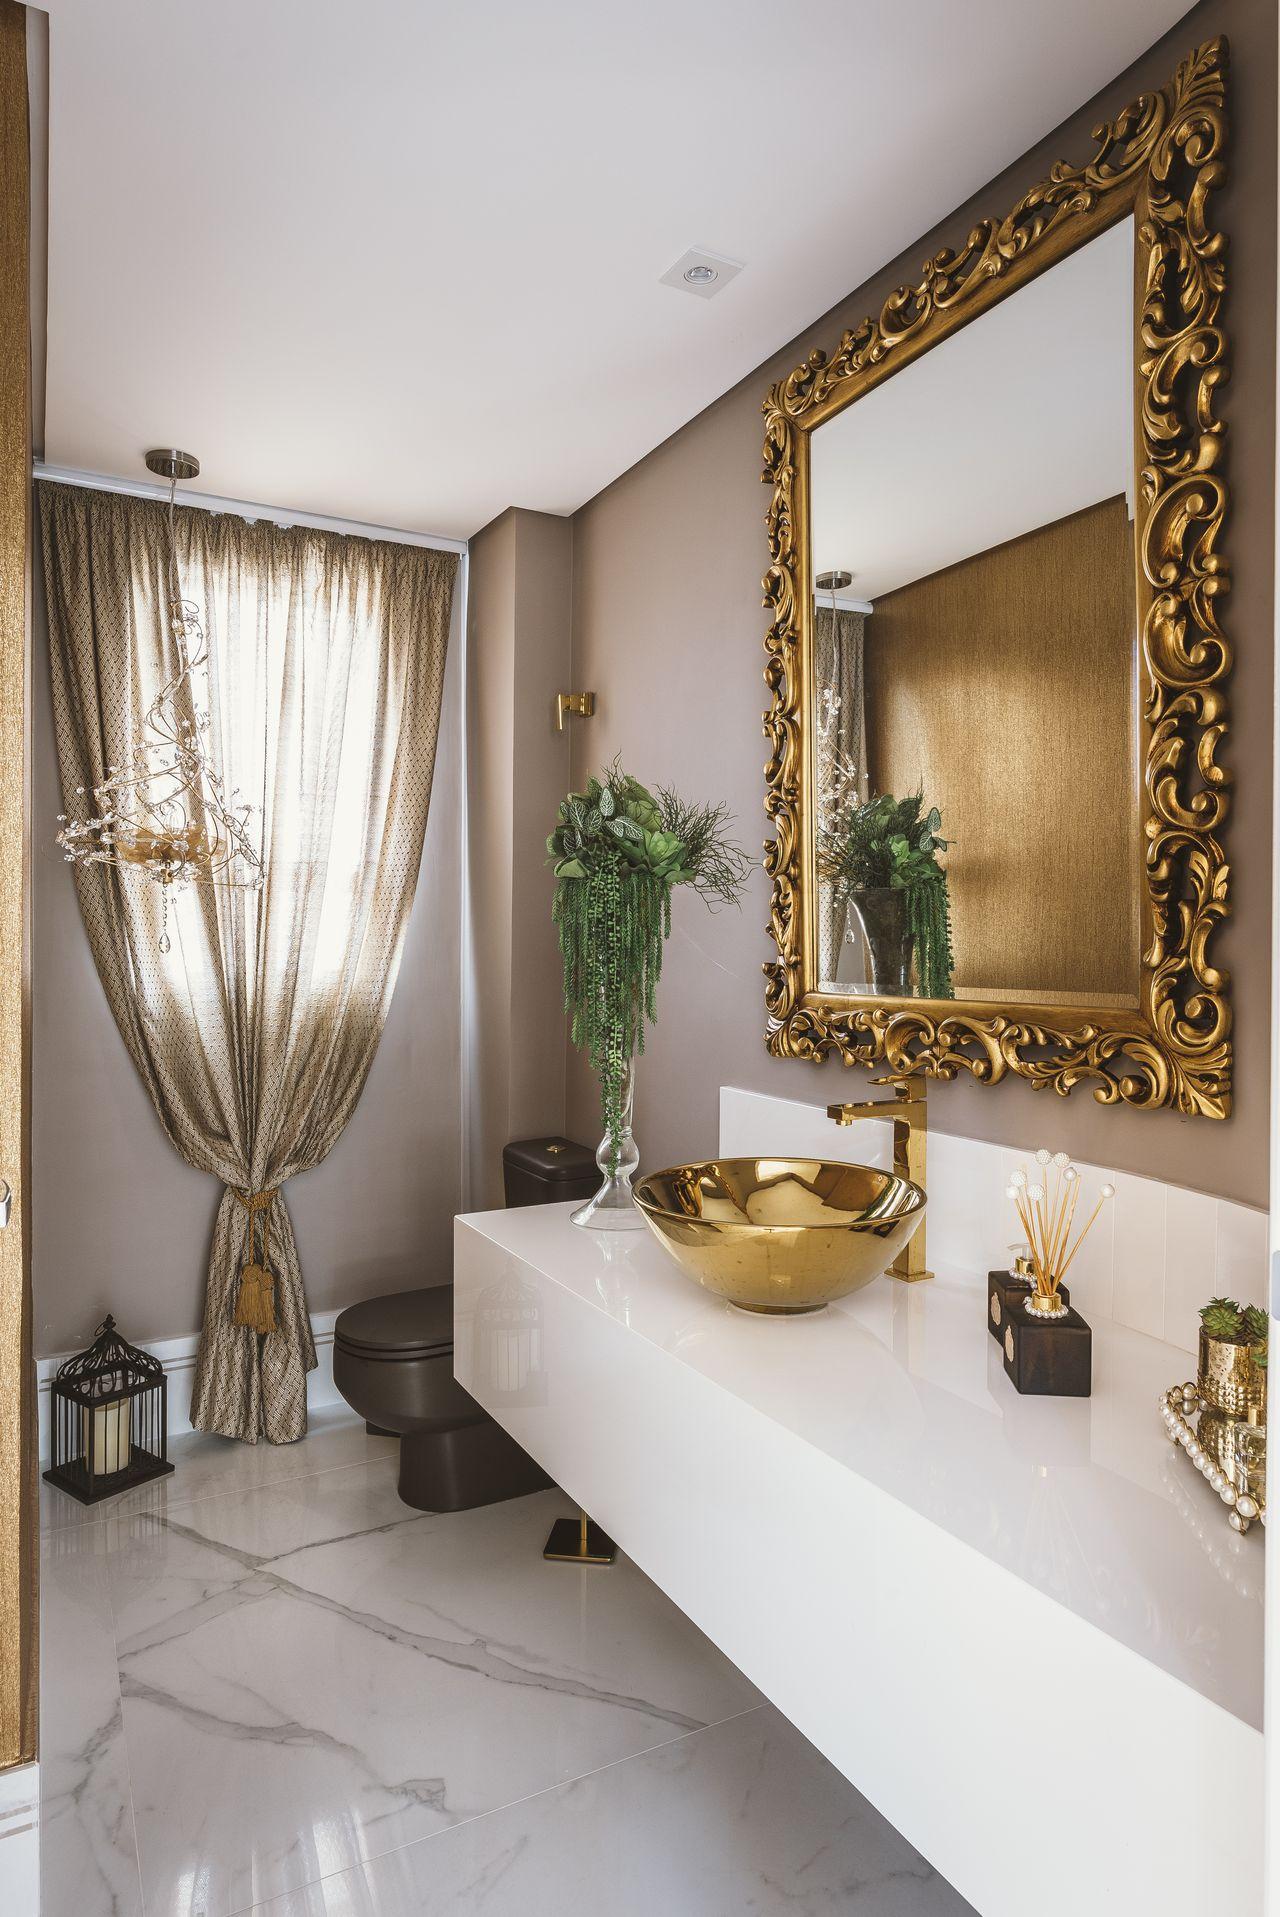 Tipos de cubas para banheiro (Projeto: Daniela Gradella)